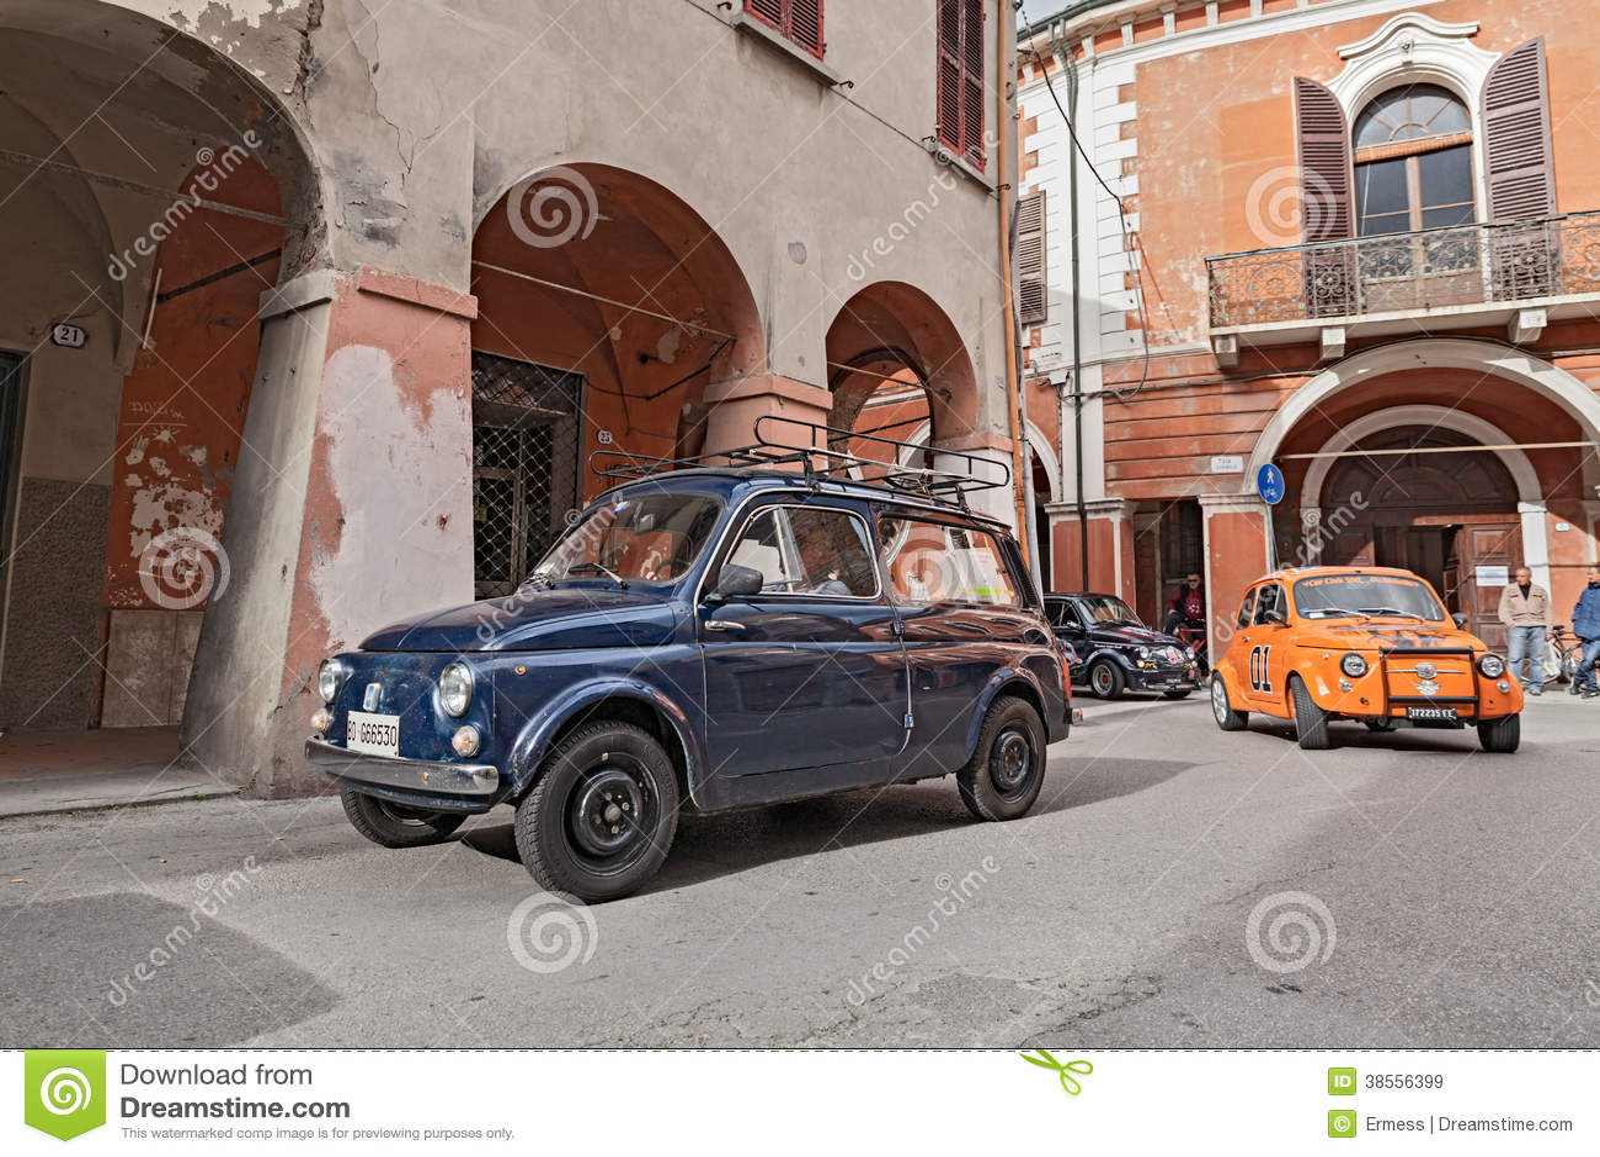 Vintage Italian Car Autobianchi 500 Giardiniera Editorial Stock